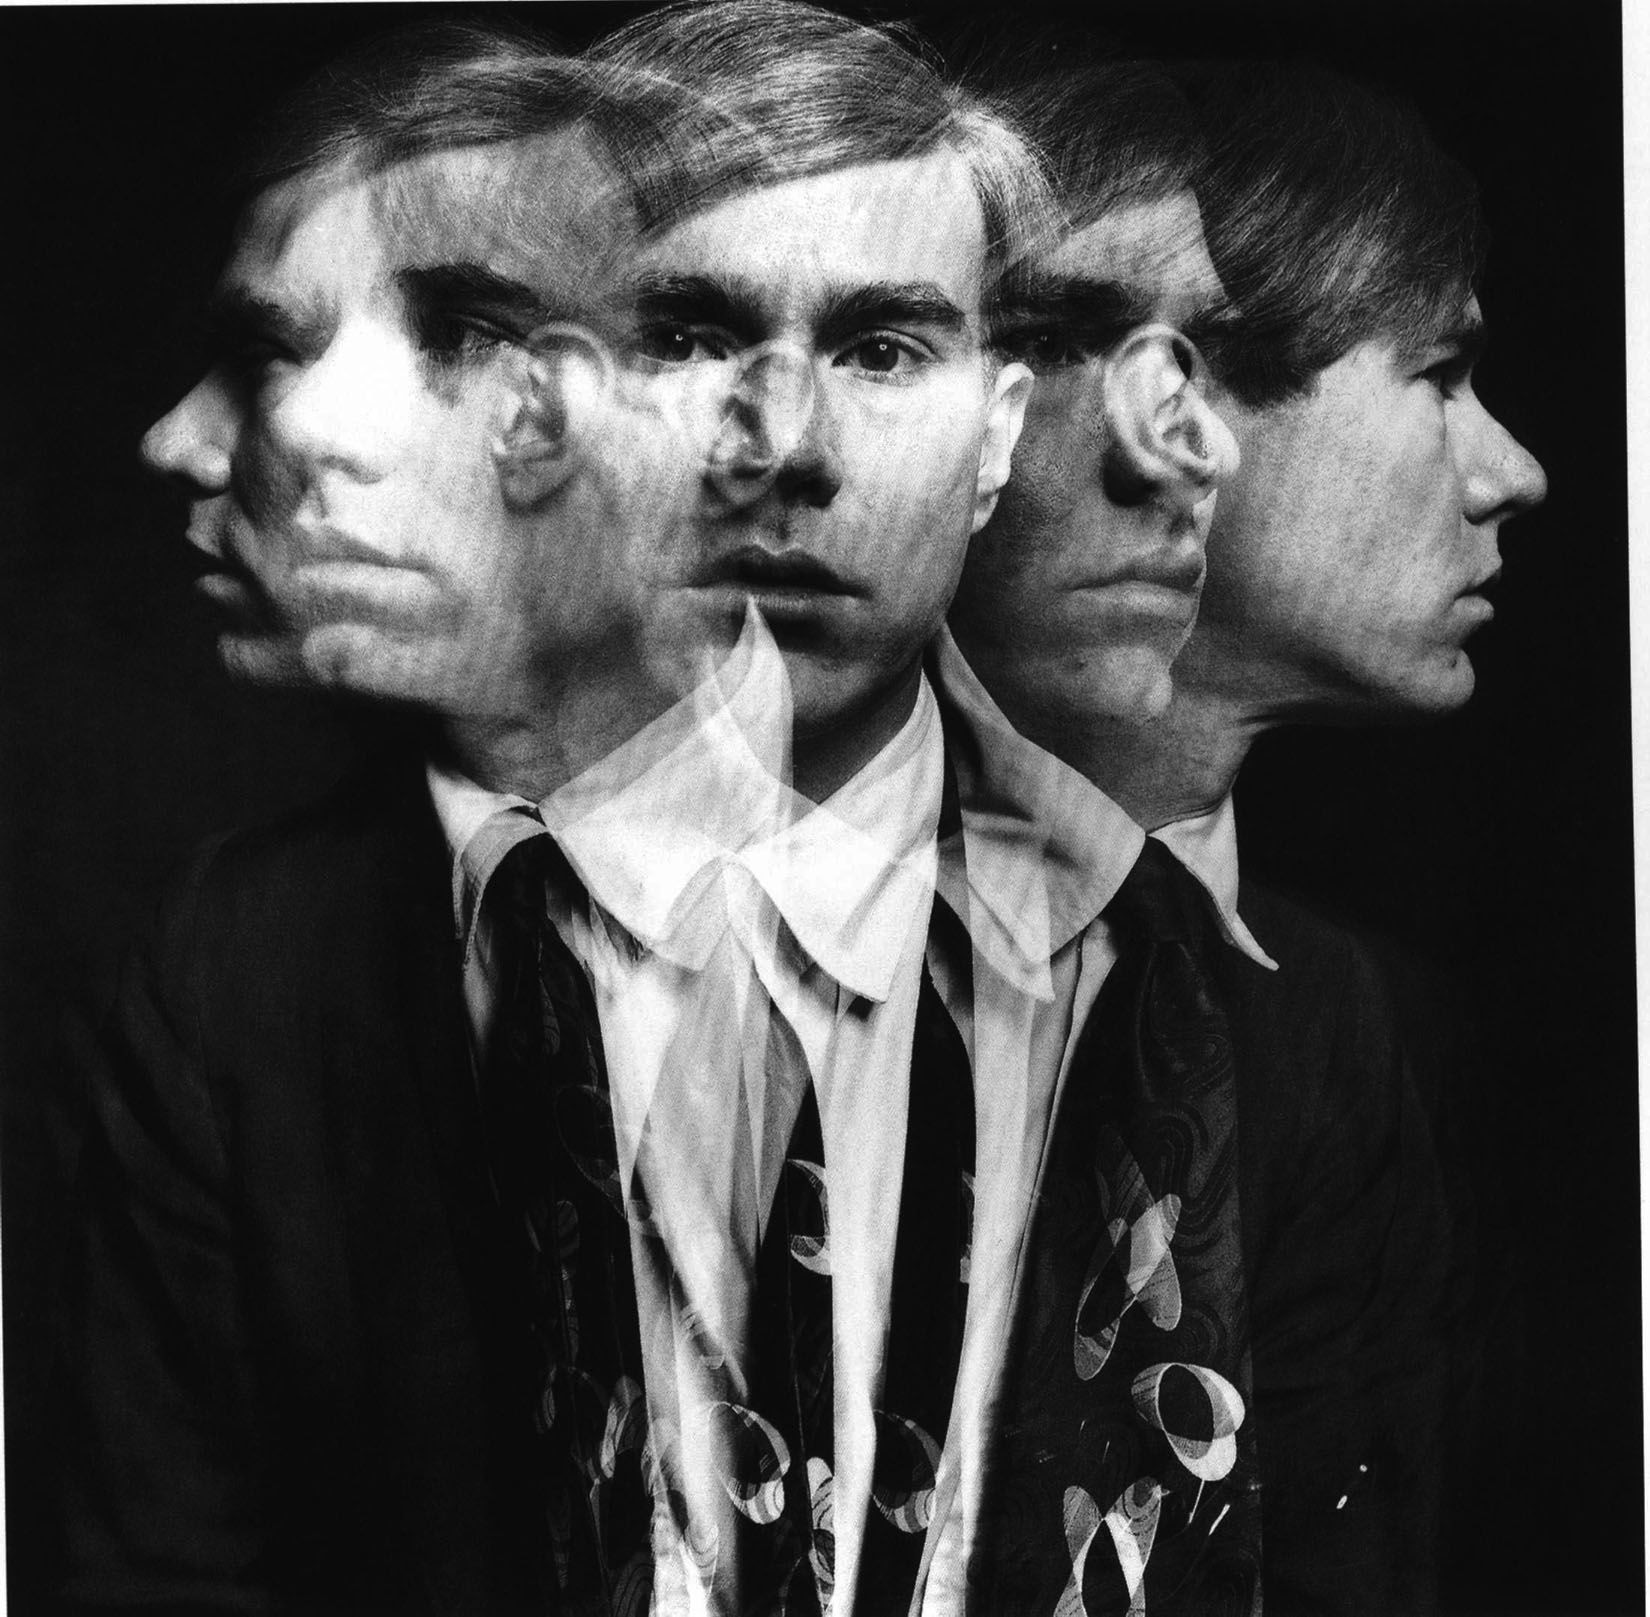 Andy Warhol versione dada